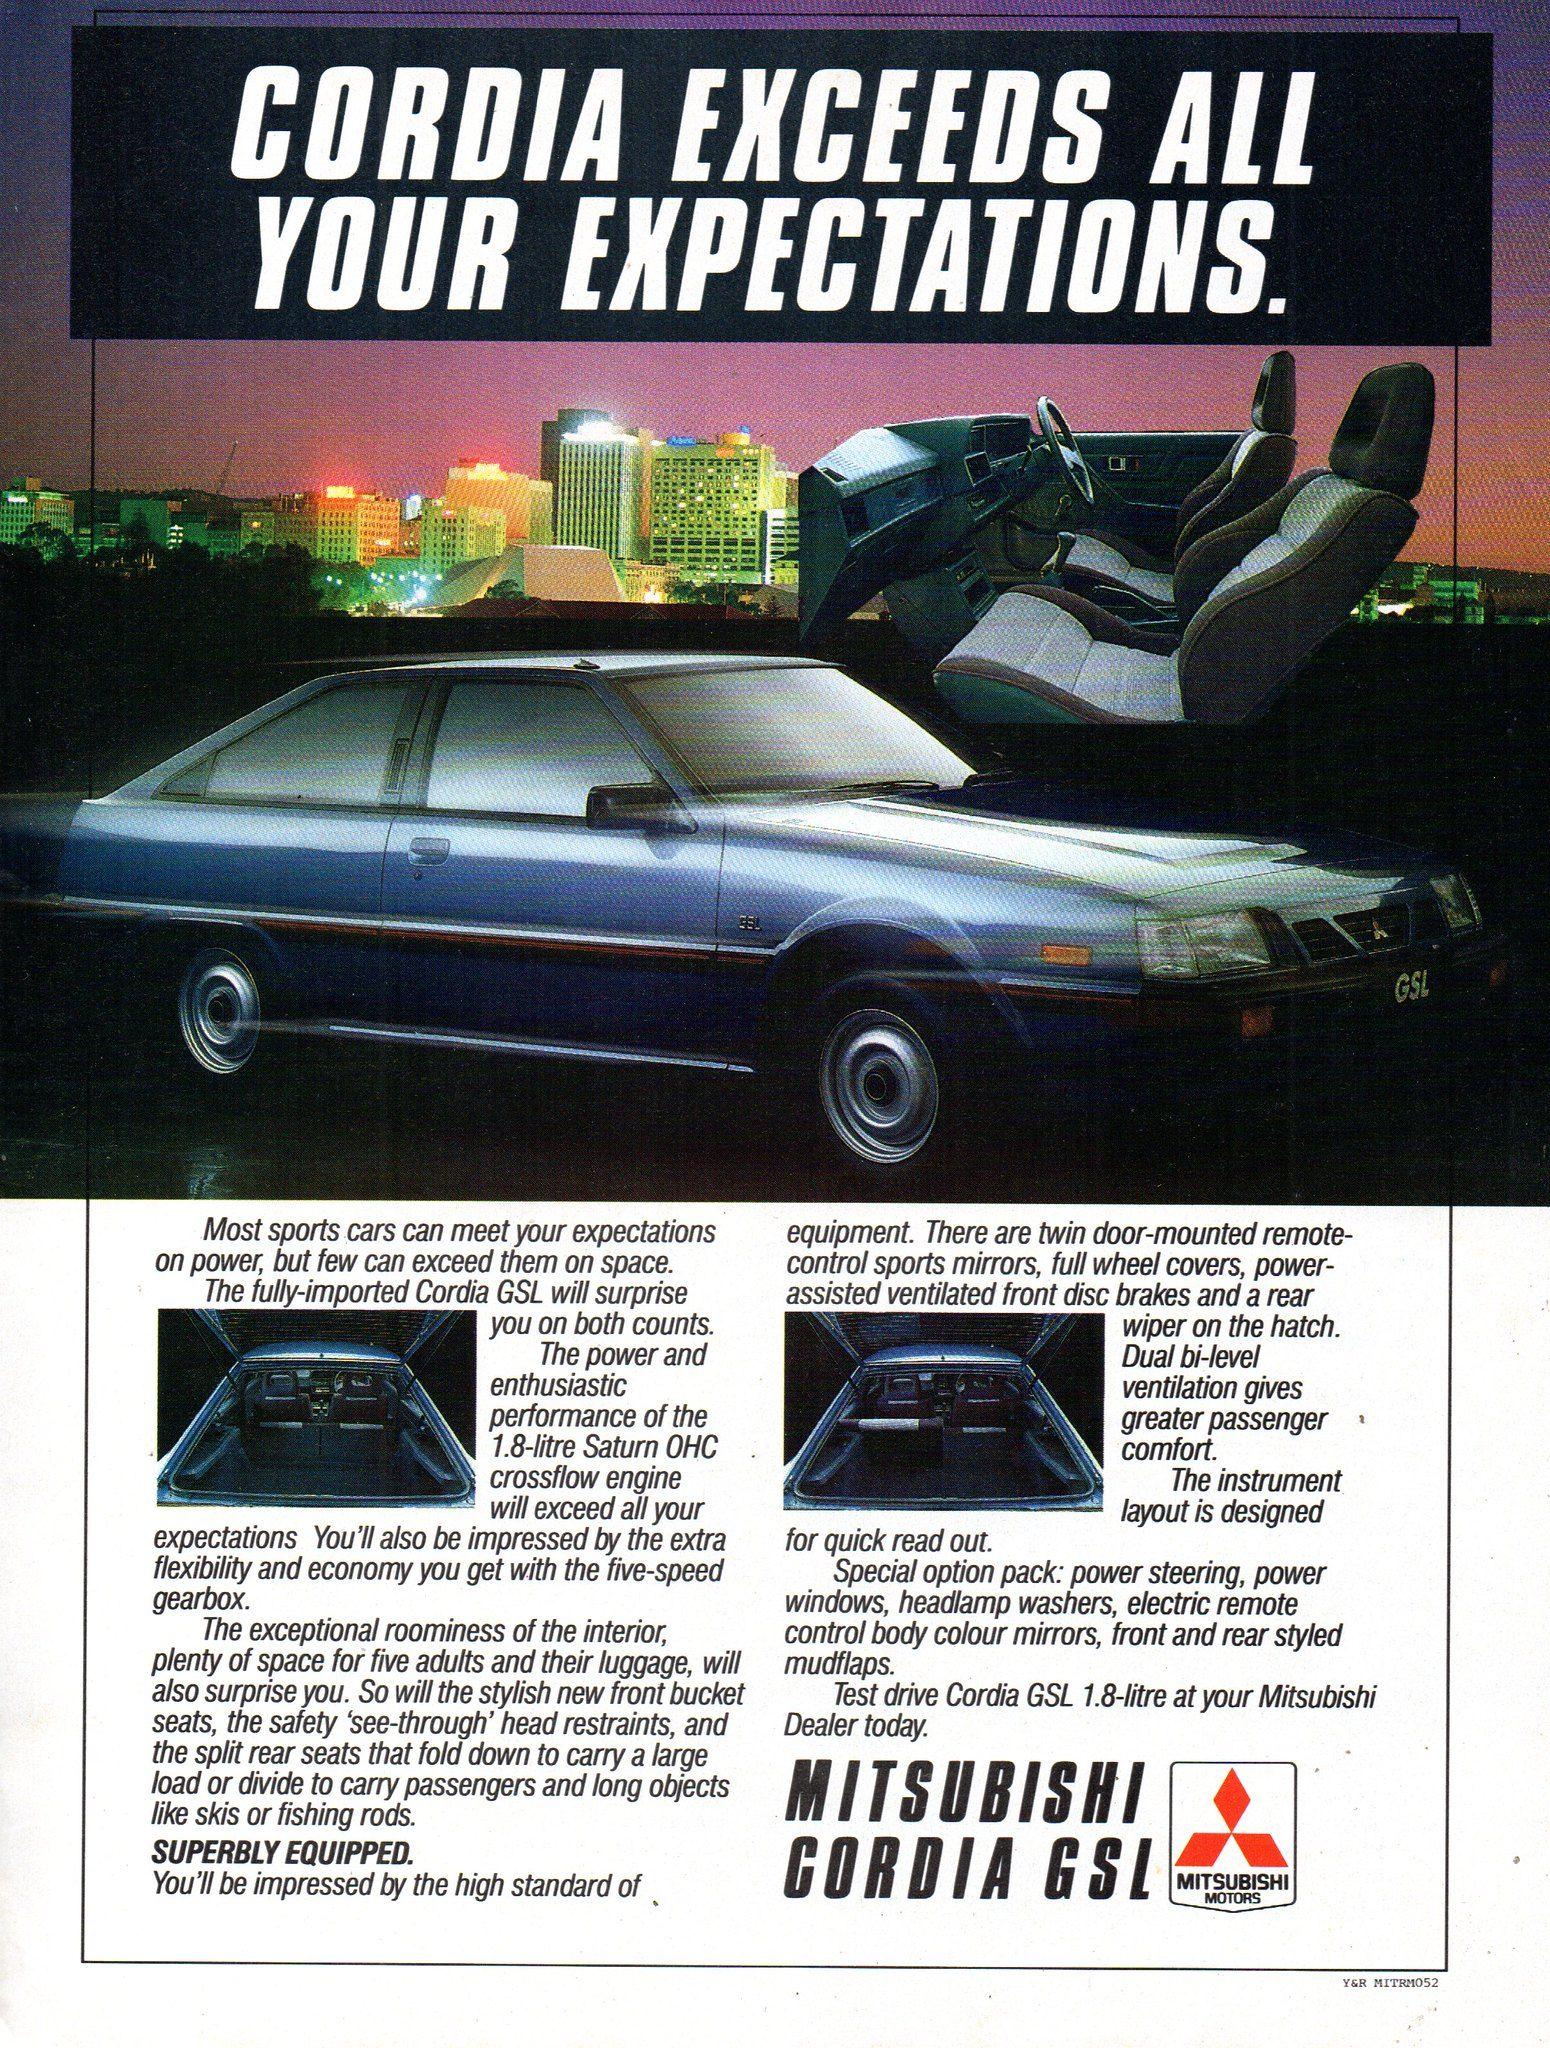 1985 Mitsubishi Cordia GSL 16 Litre Saturn OHC Hatchback